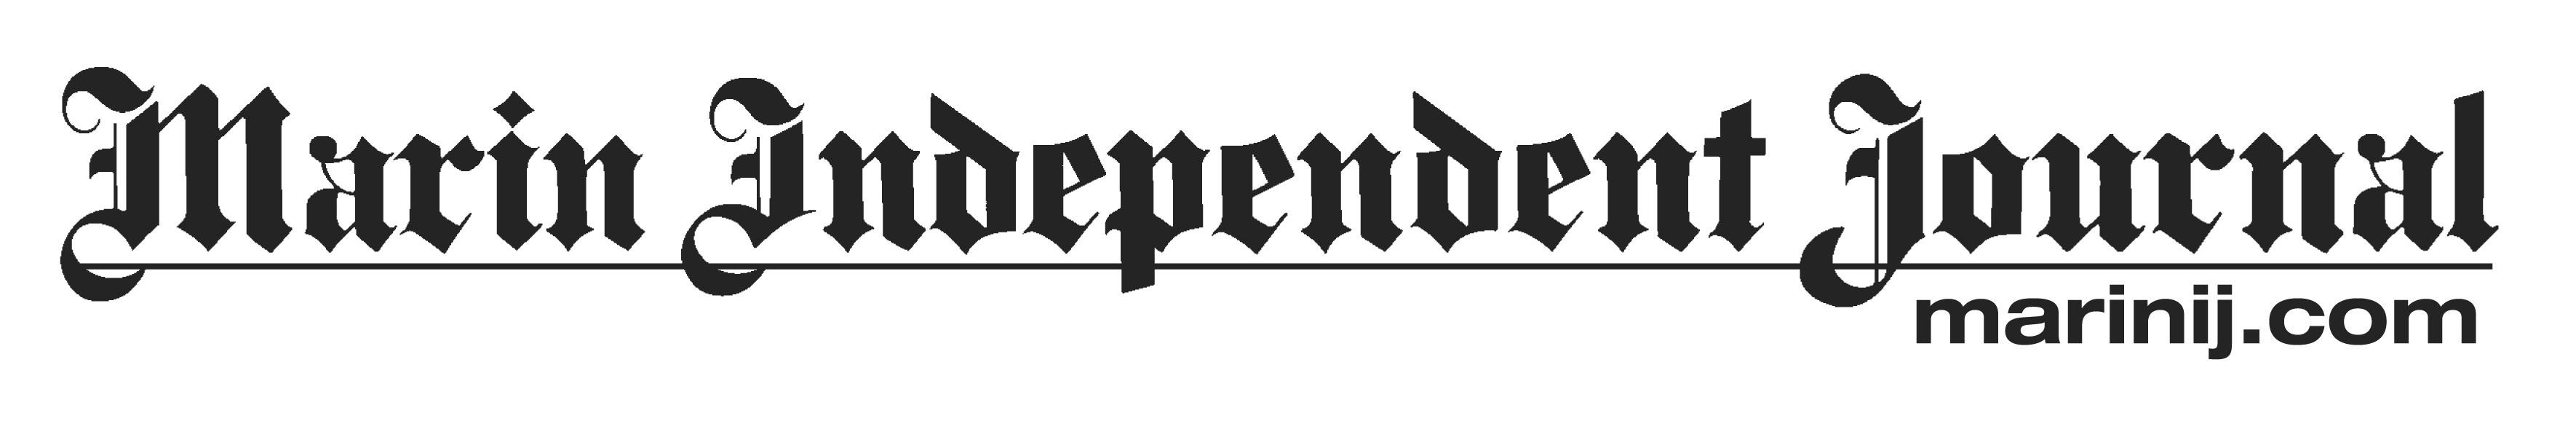 Marin_Independent_Journal_Logo.JPG